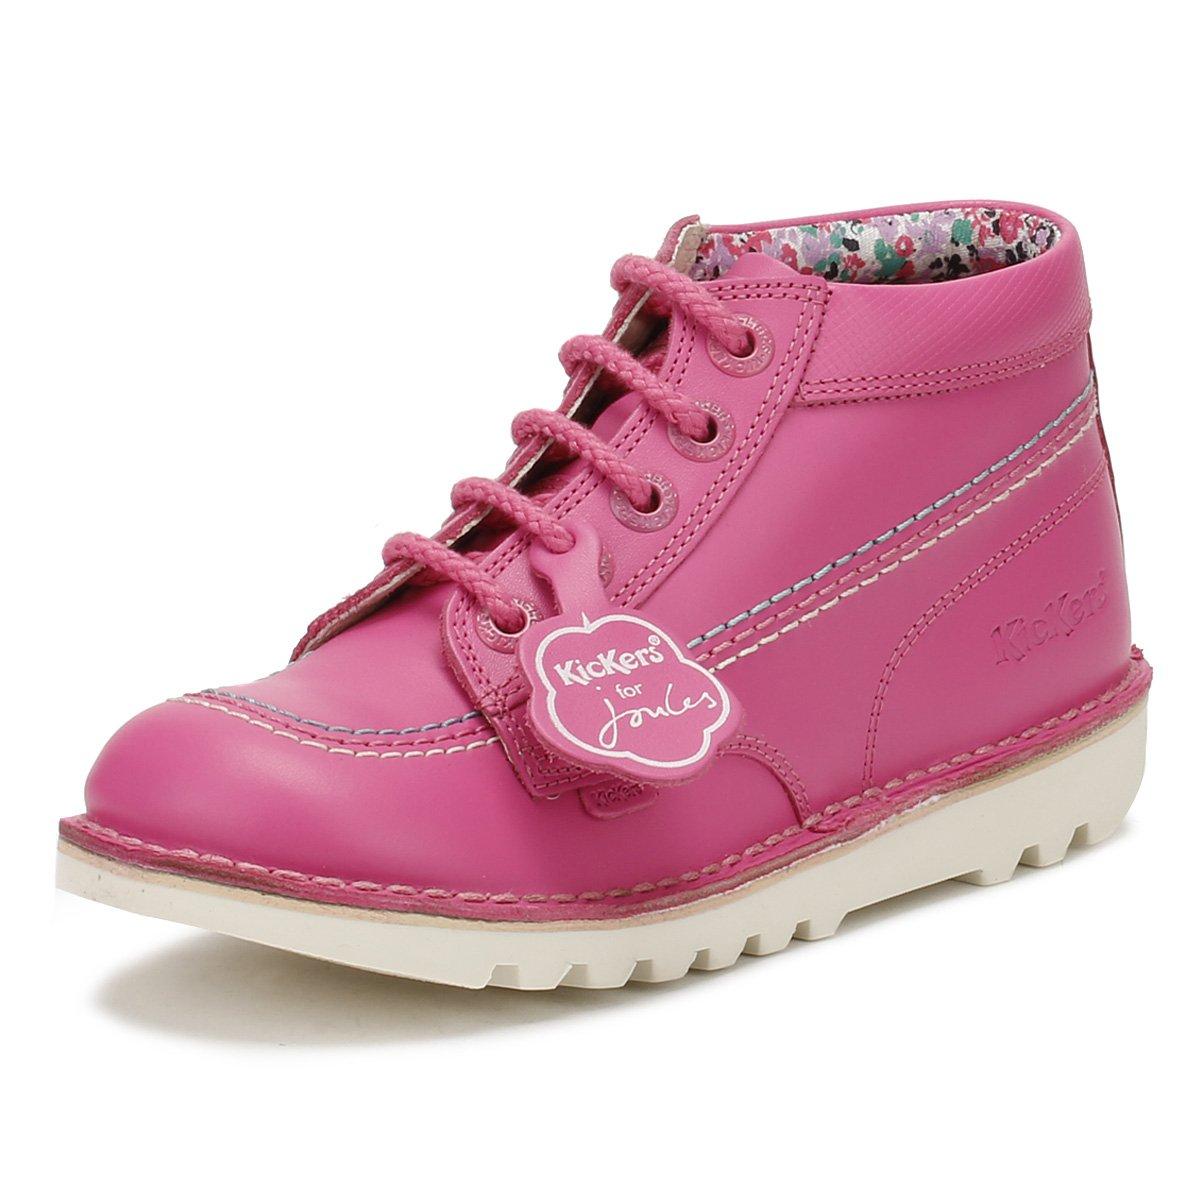 Kickers Joules Junior Pink Leather Kick Hi Boots-UK 13 Kids